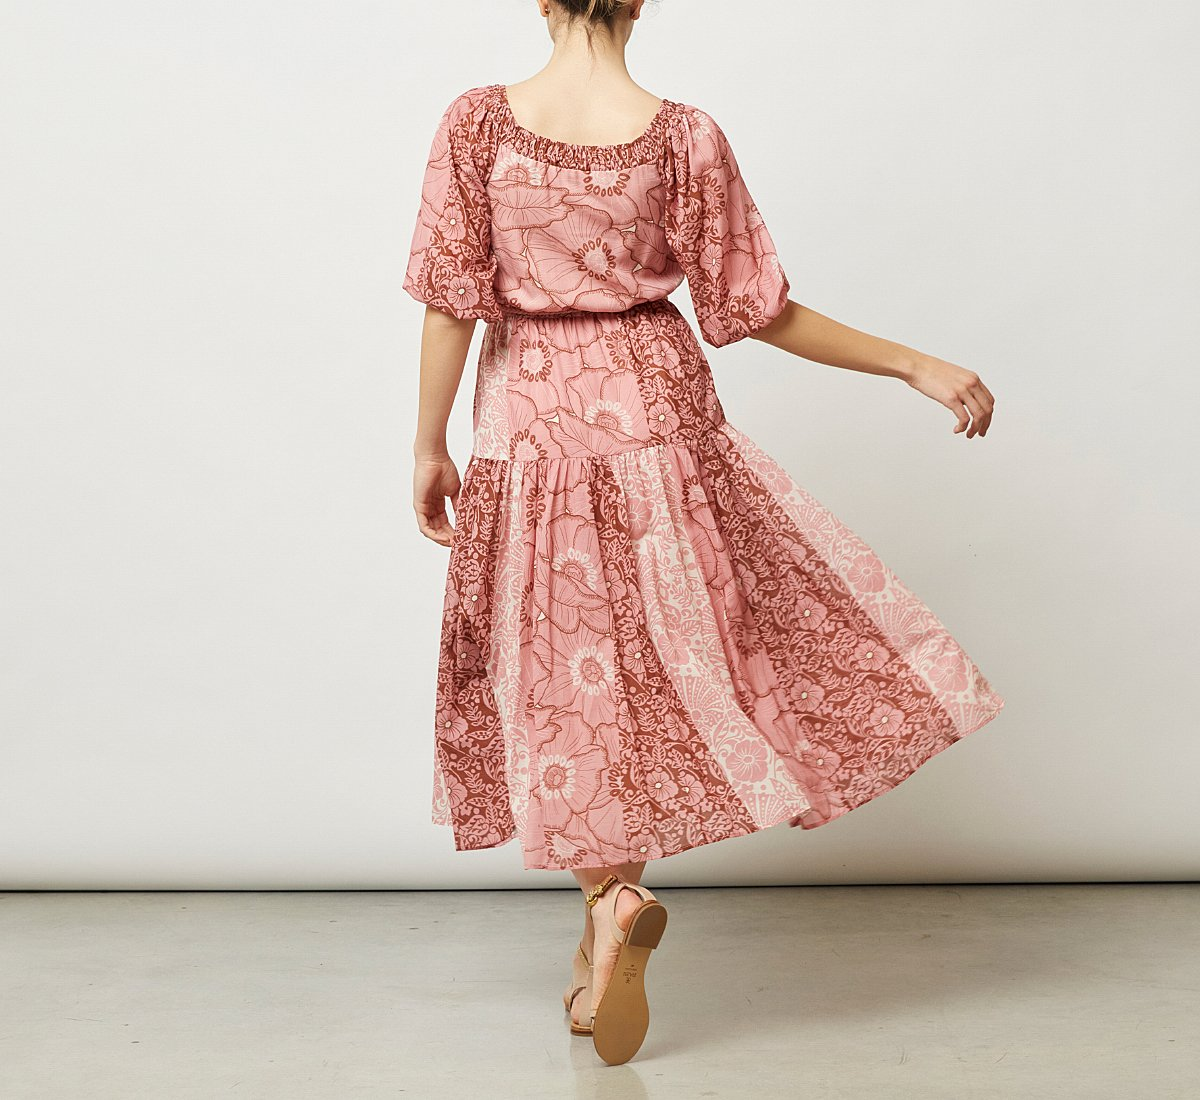 Light fabric dress